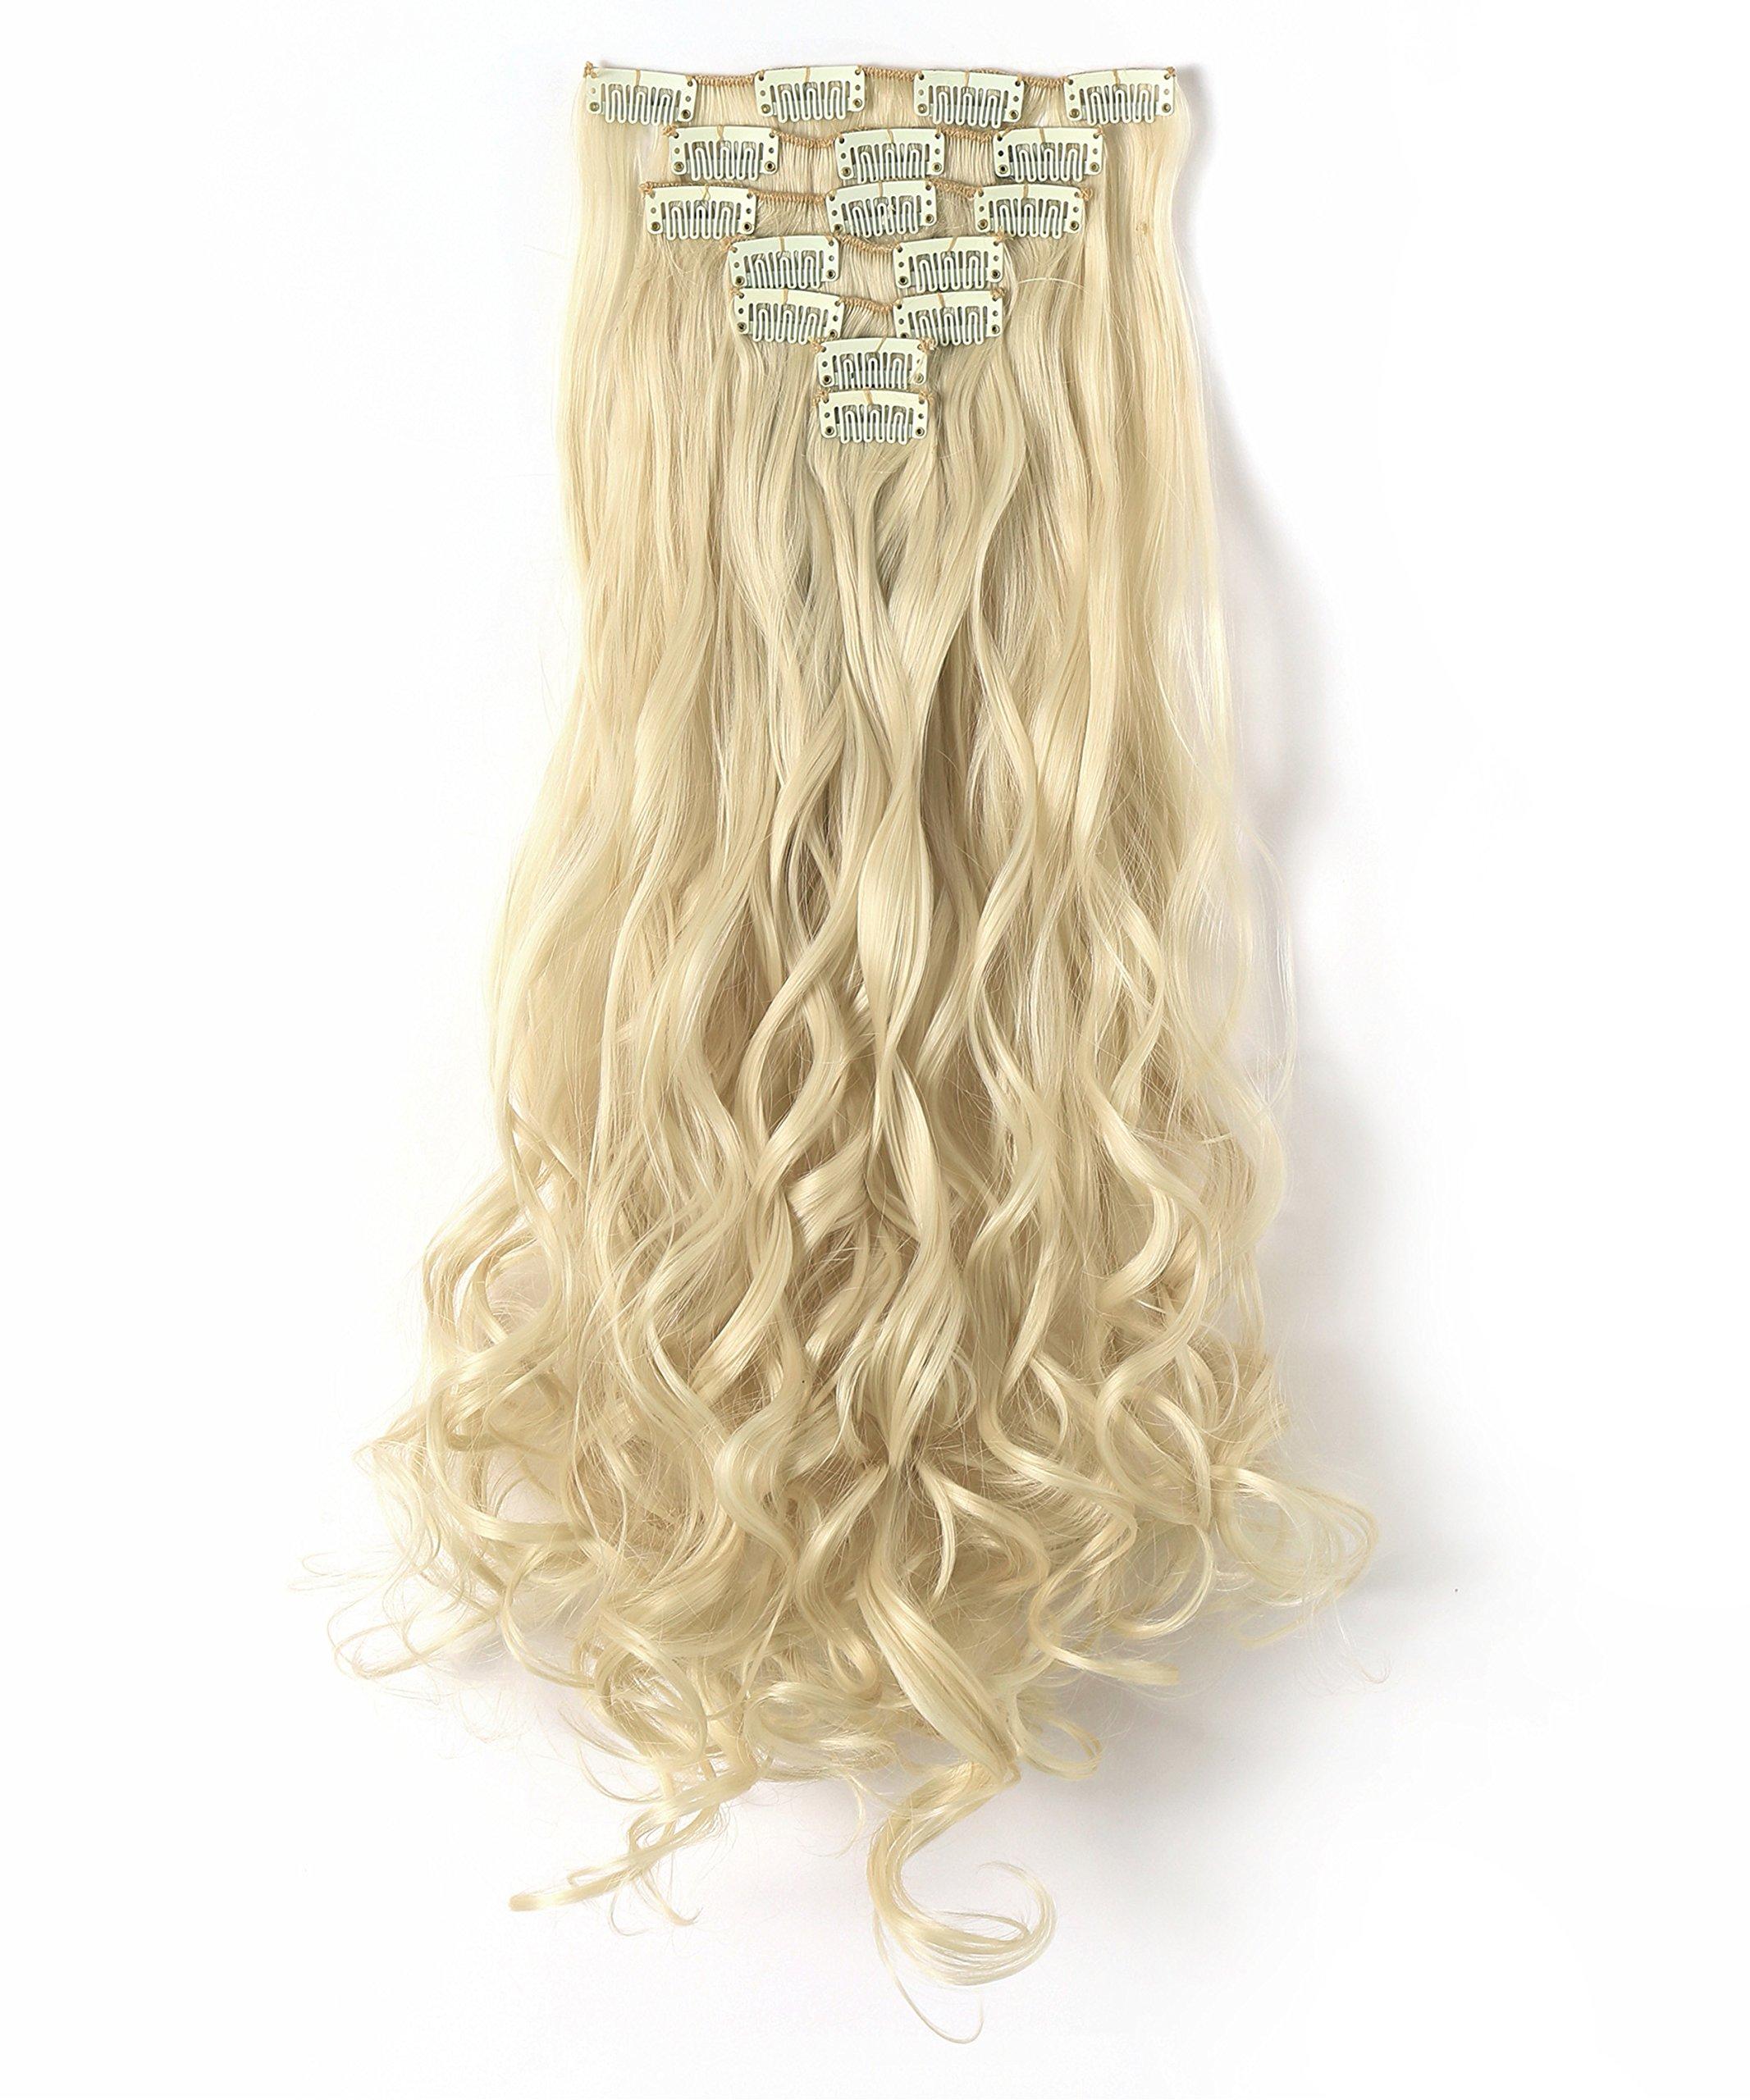 Amazon S Noilite 23 Straightcurly Bleach Blonde Full Head